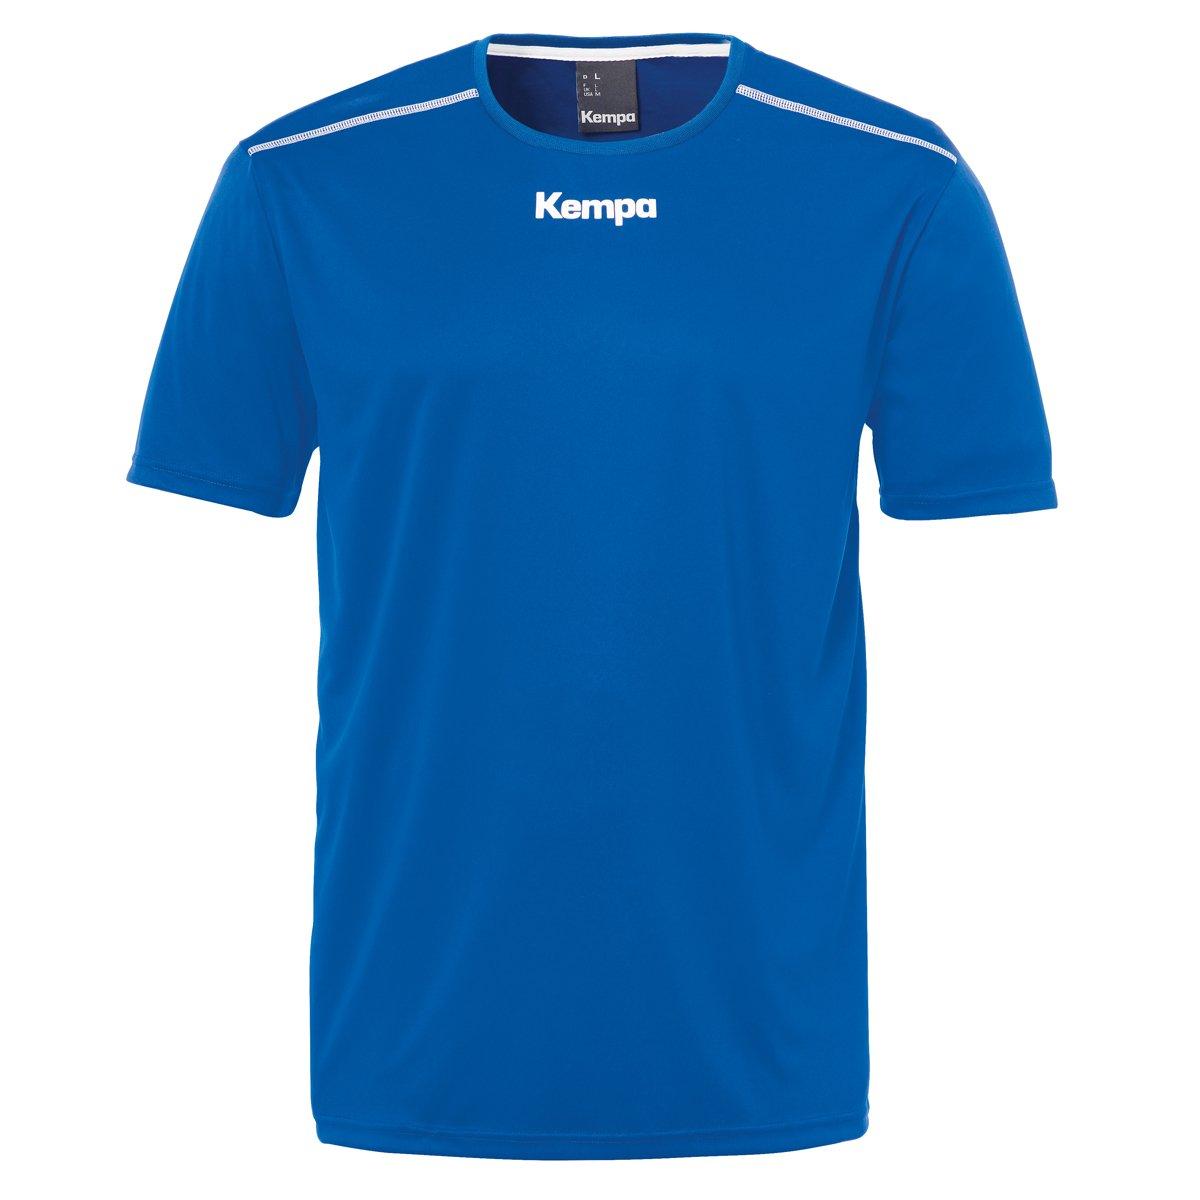 TALLA S. Kempa Poly Camiseta de Entrenamiento, Hombre